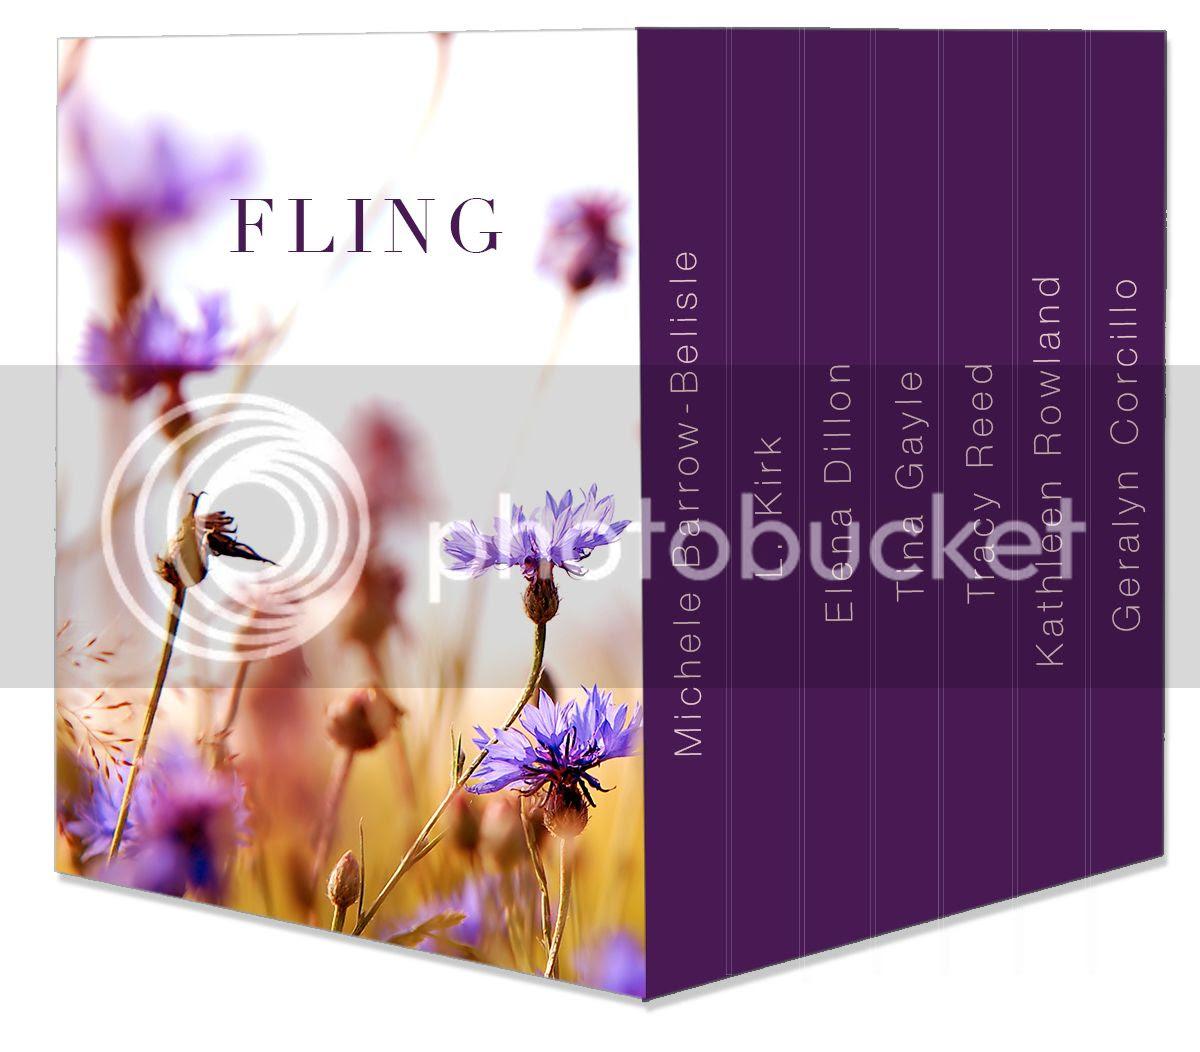 Fling BoxSet photo fling_box_set_mockup_v5_zps2ldnlg96.jpg